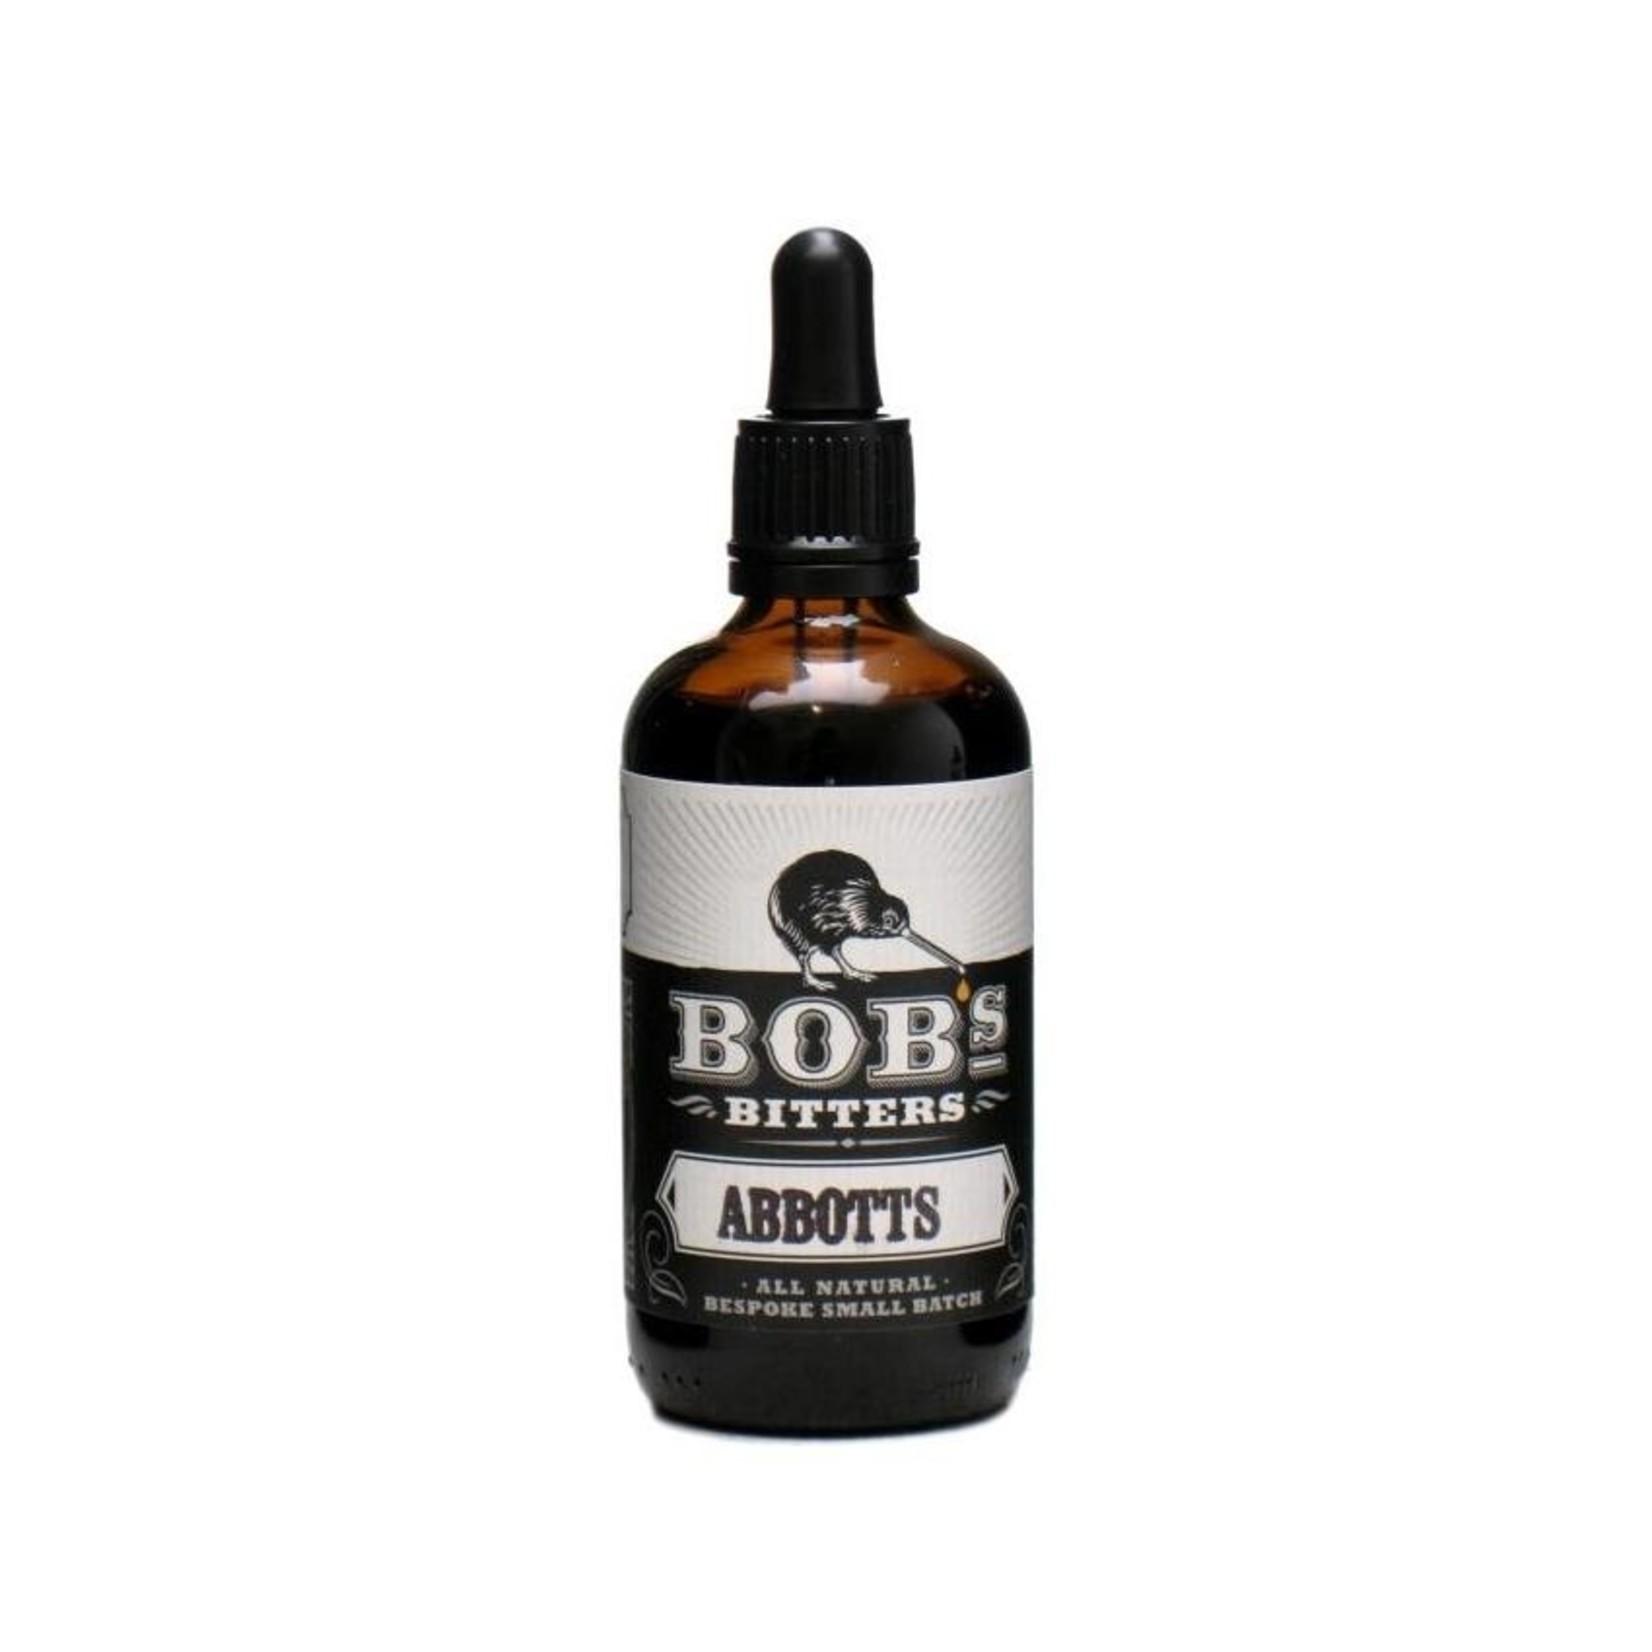 Bob's Bitters Bobs Bitters Abbotts